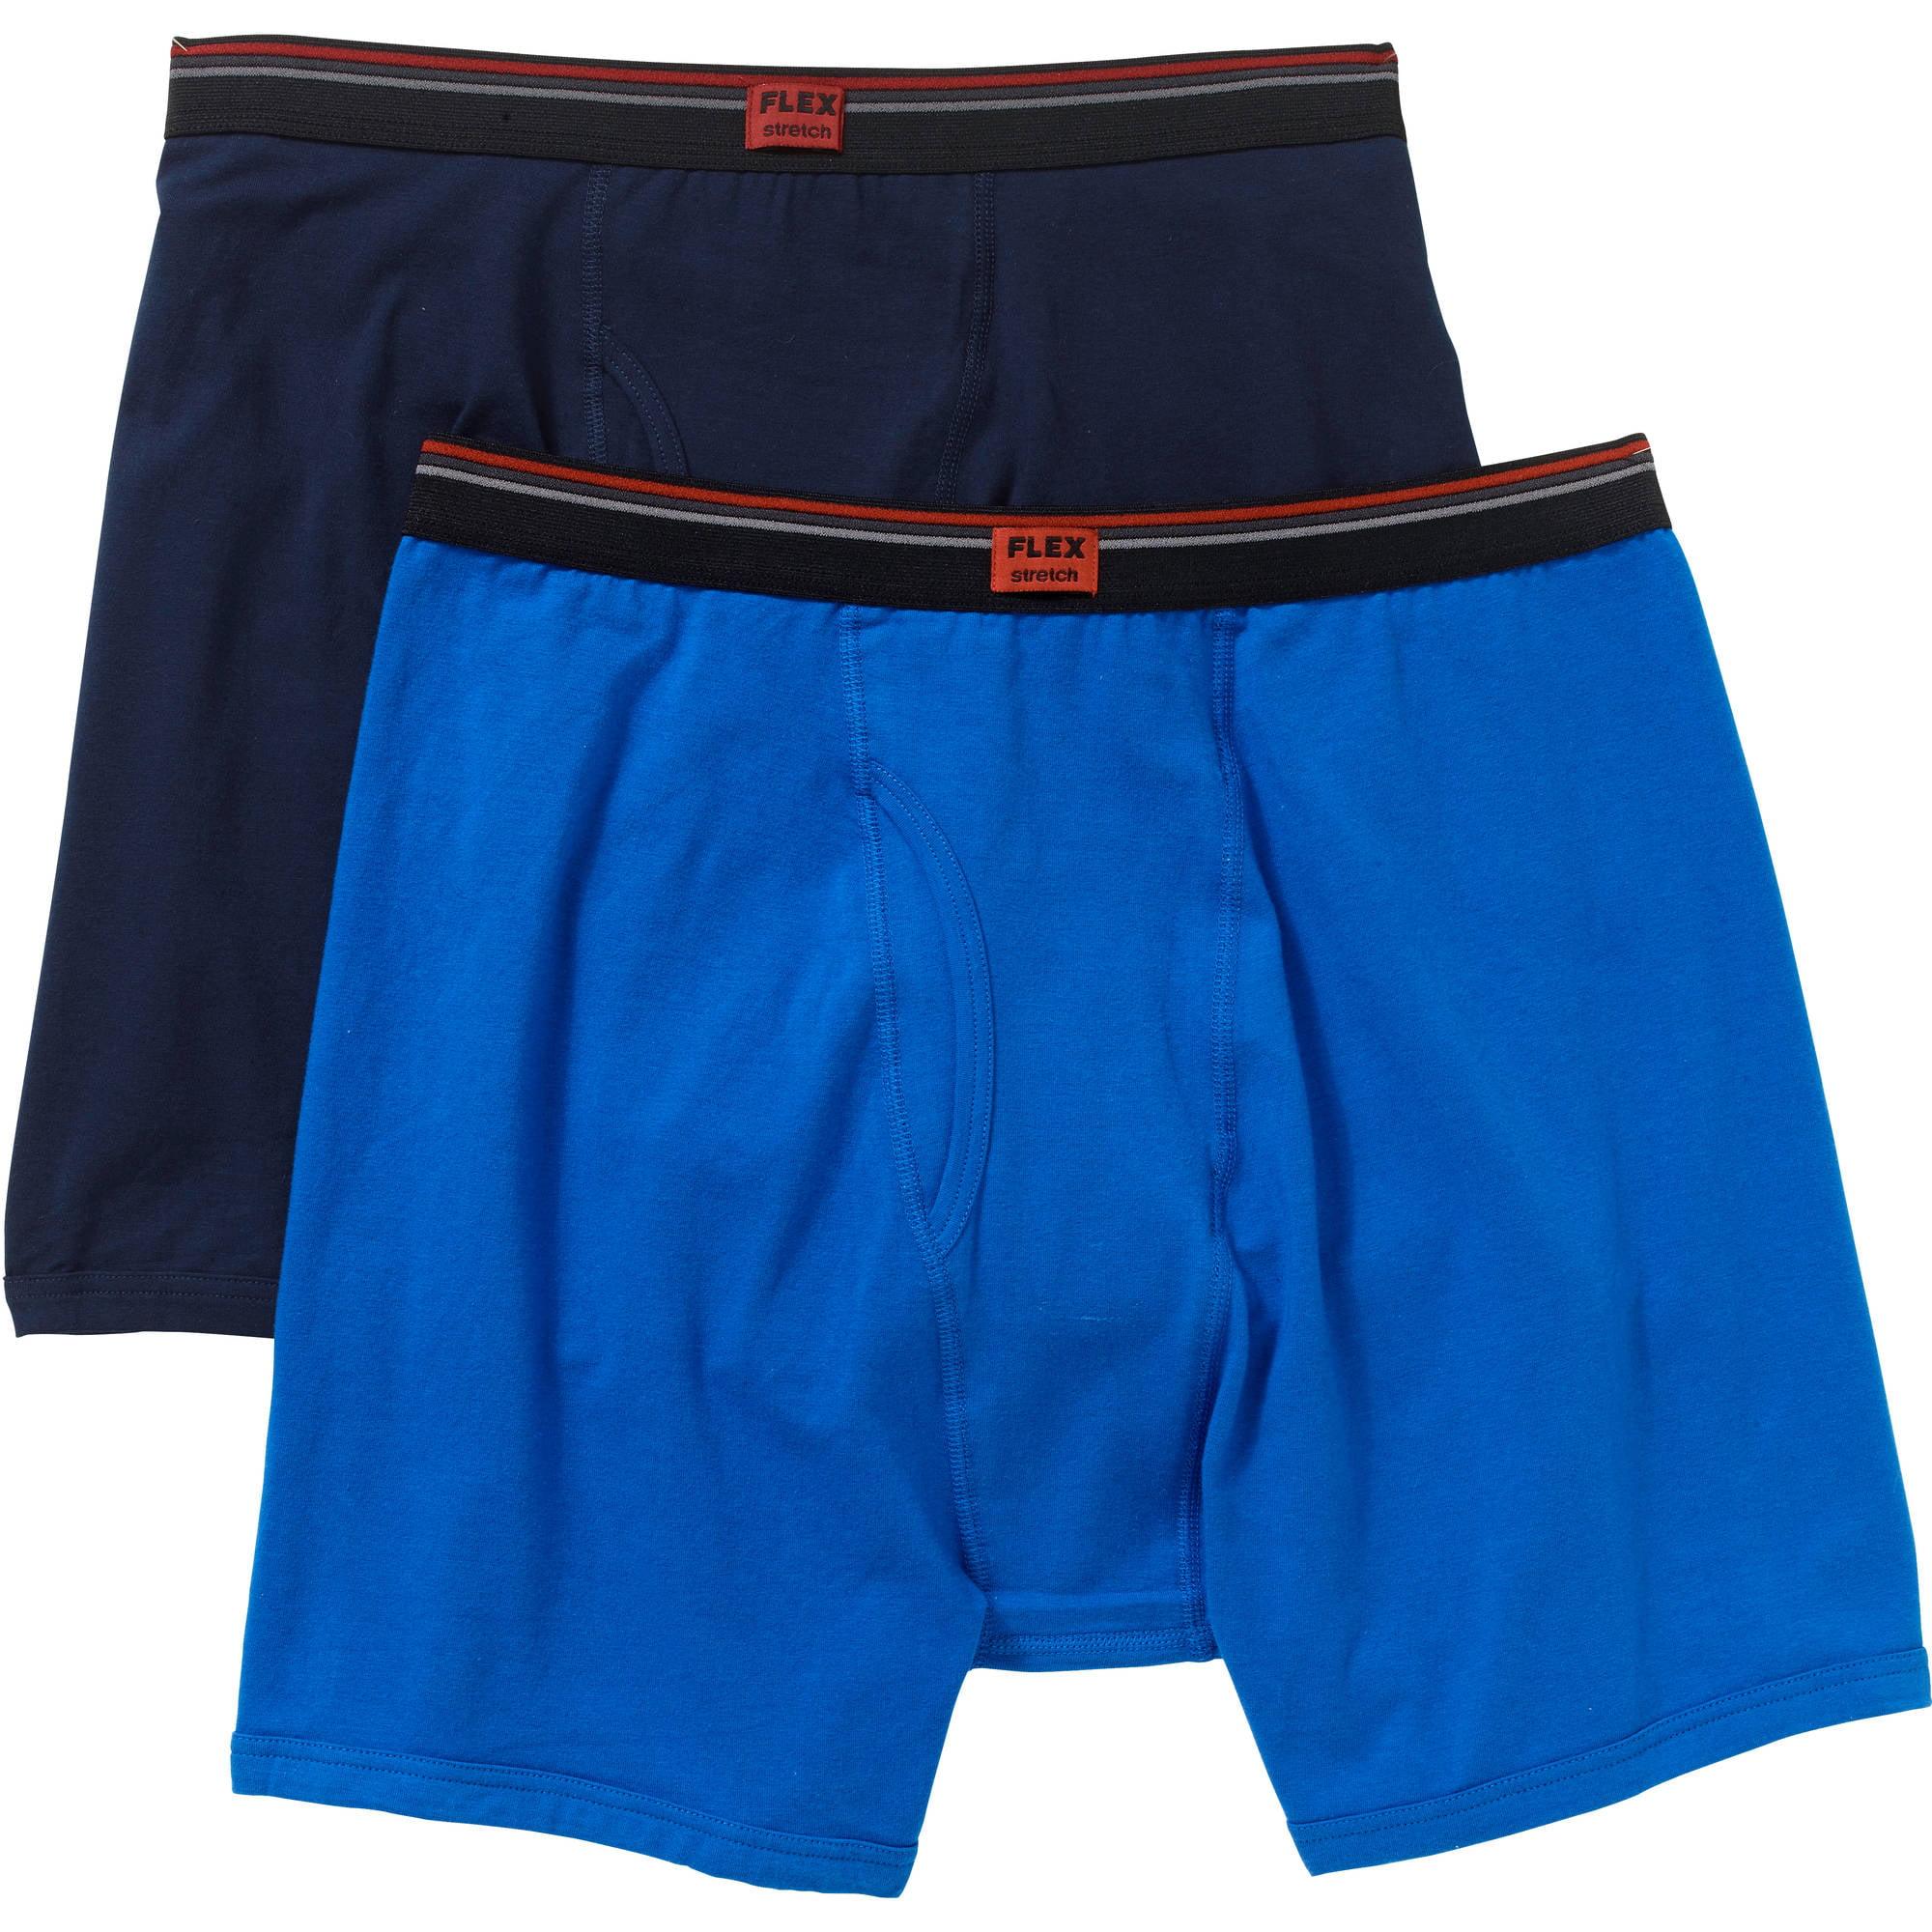 Life by Jockey Men's Long Leg Boxer Briefs, 2-Pack by Generic